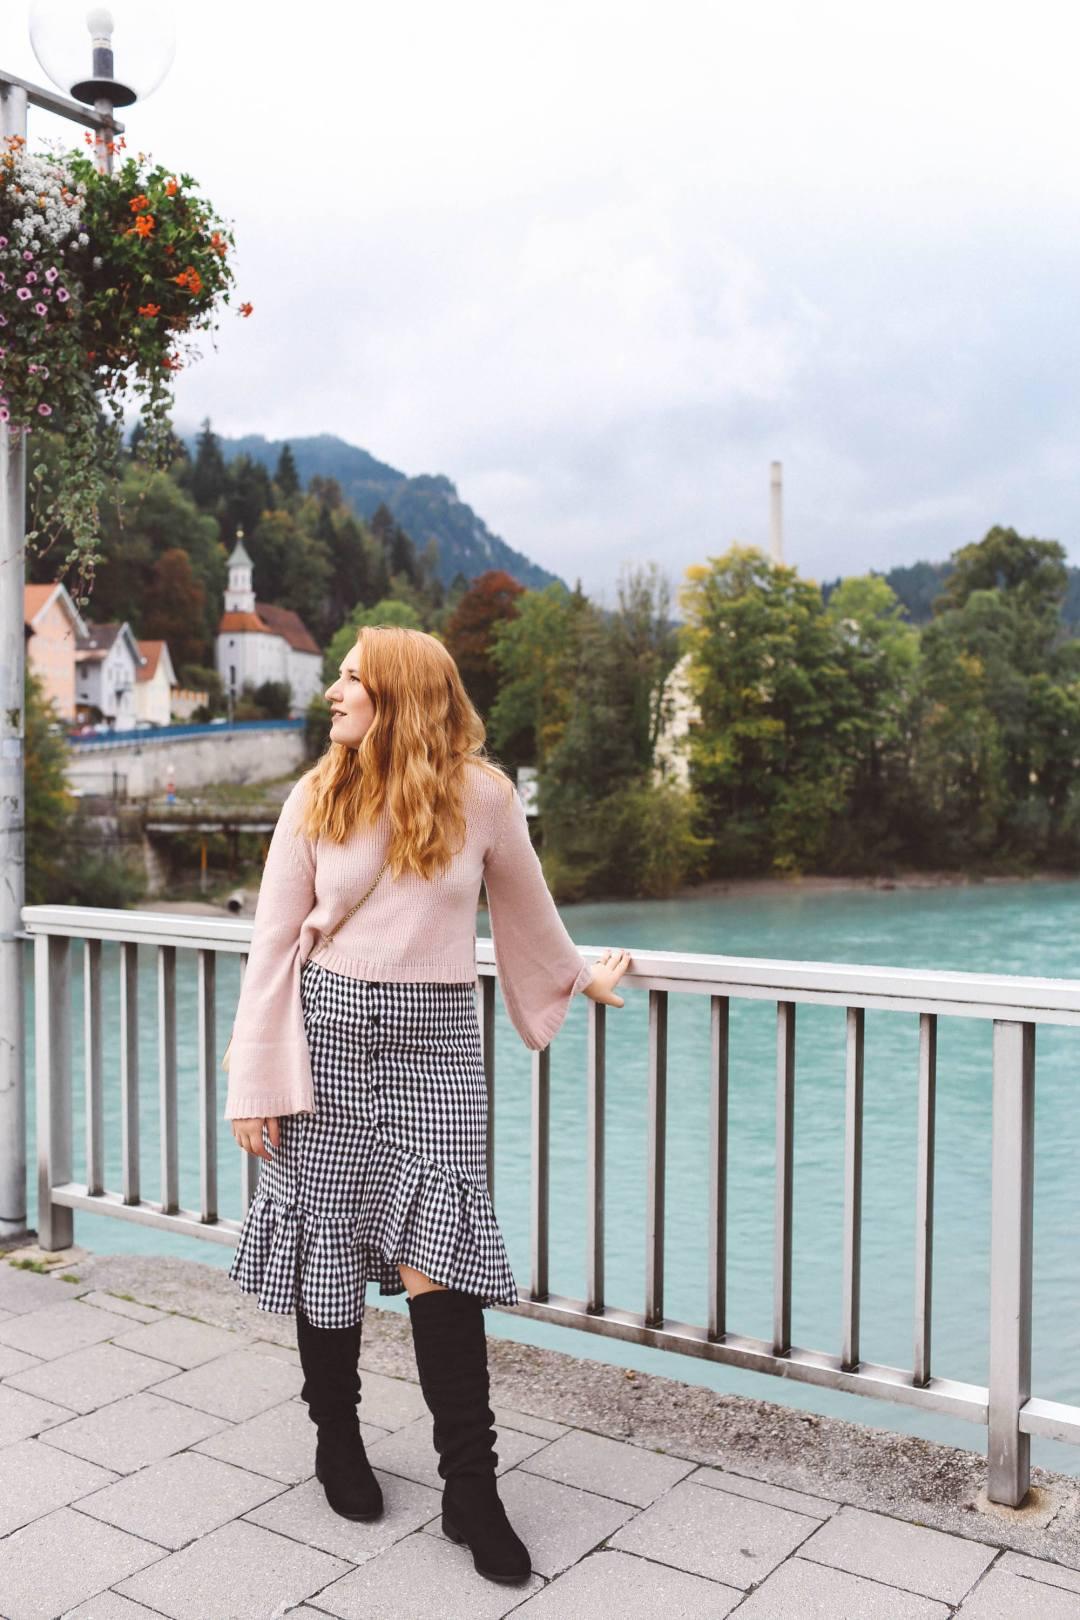 Füssen, Germany pink sweater gingham skirt